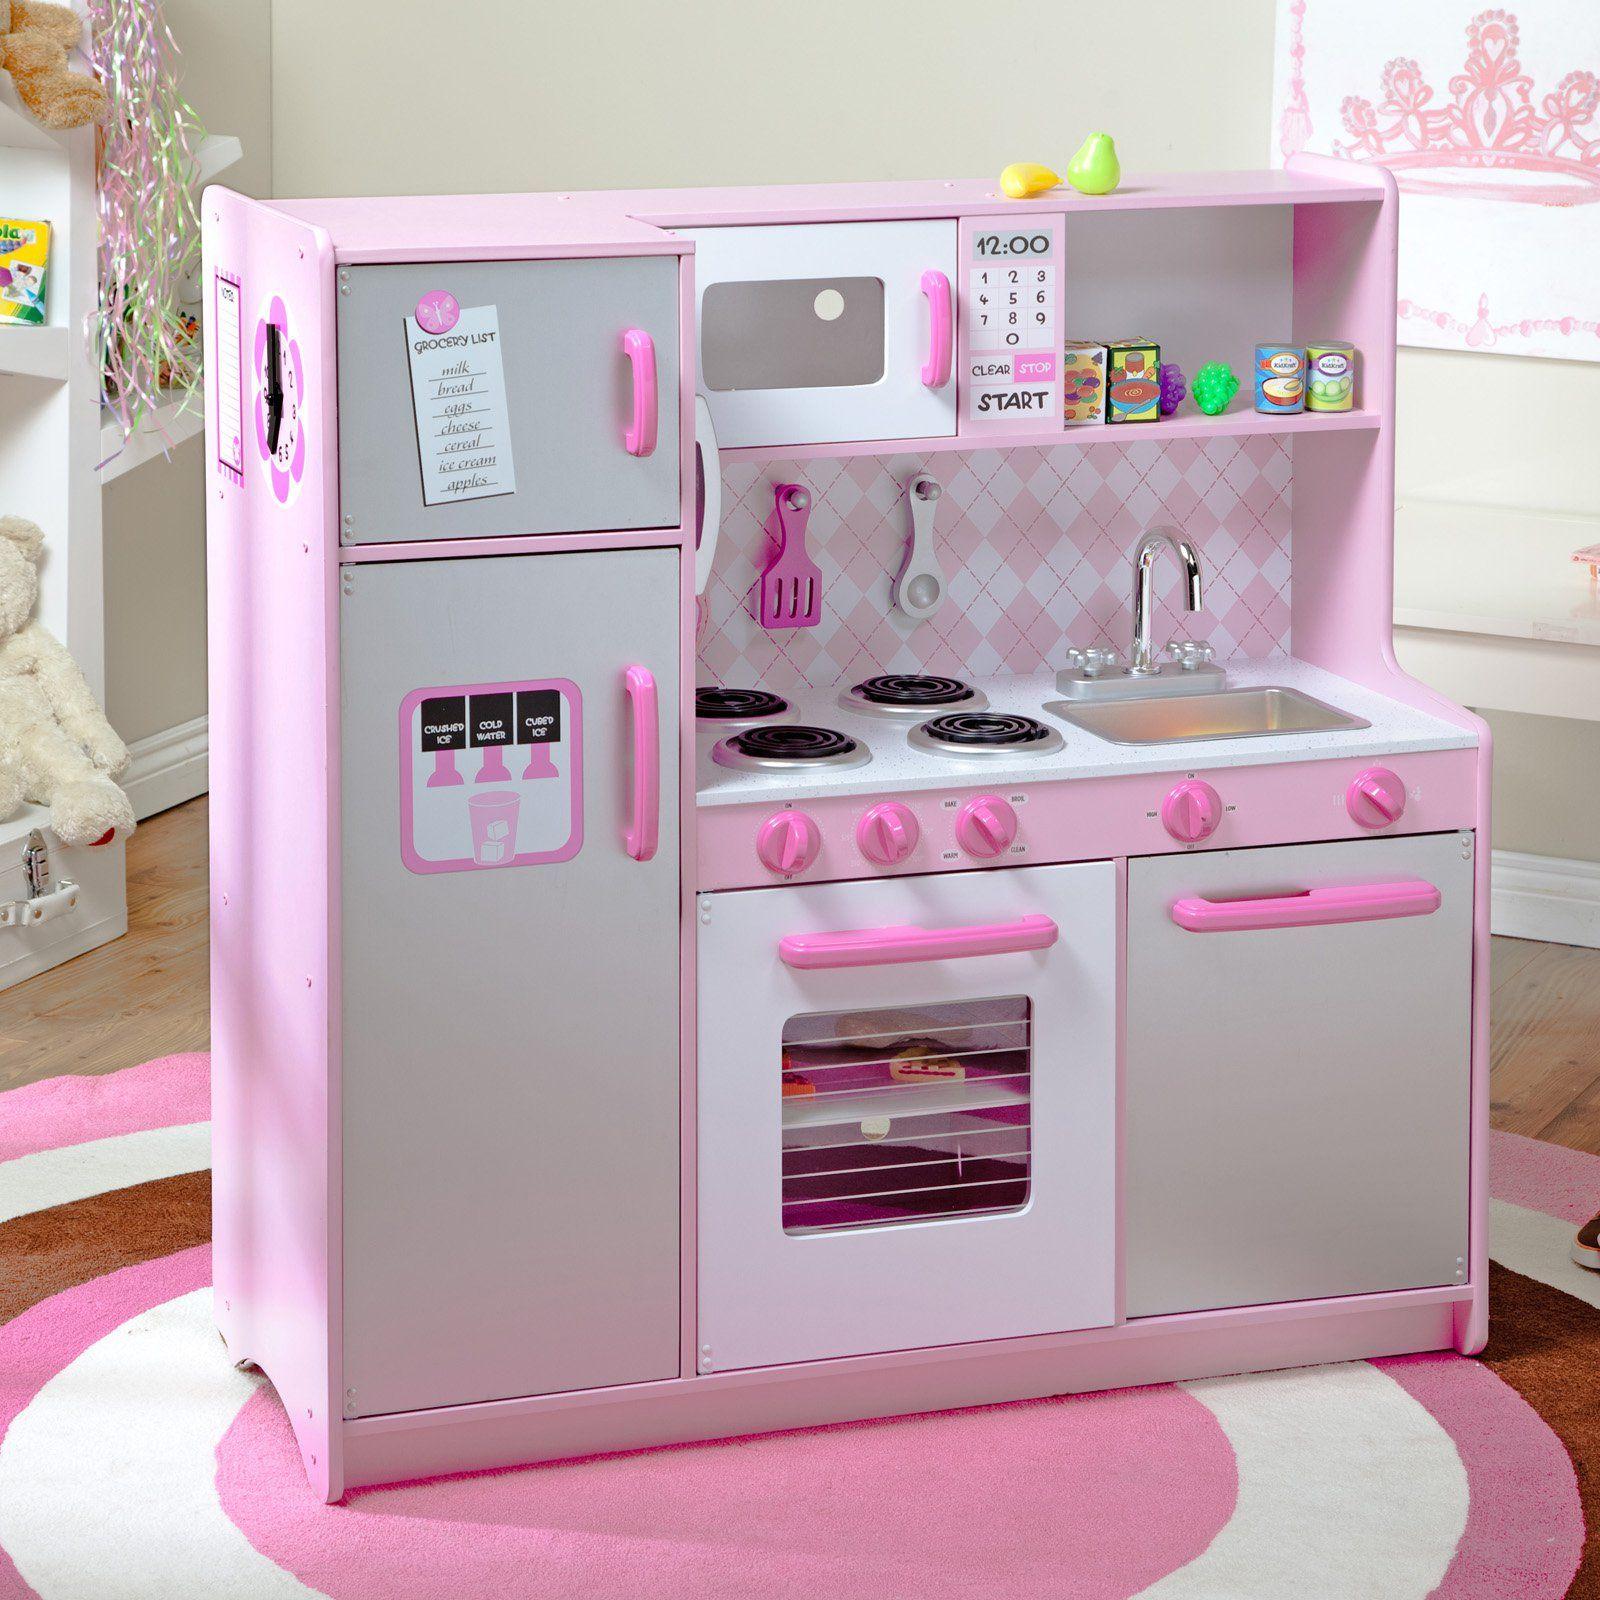 Kidkraft Play Kitchen Set kidkraft argyle play kitchen with 60-pc. food set - 53287 - your